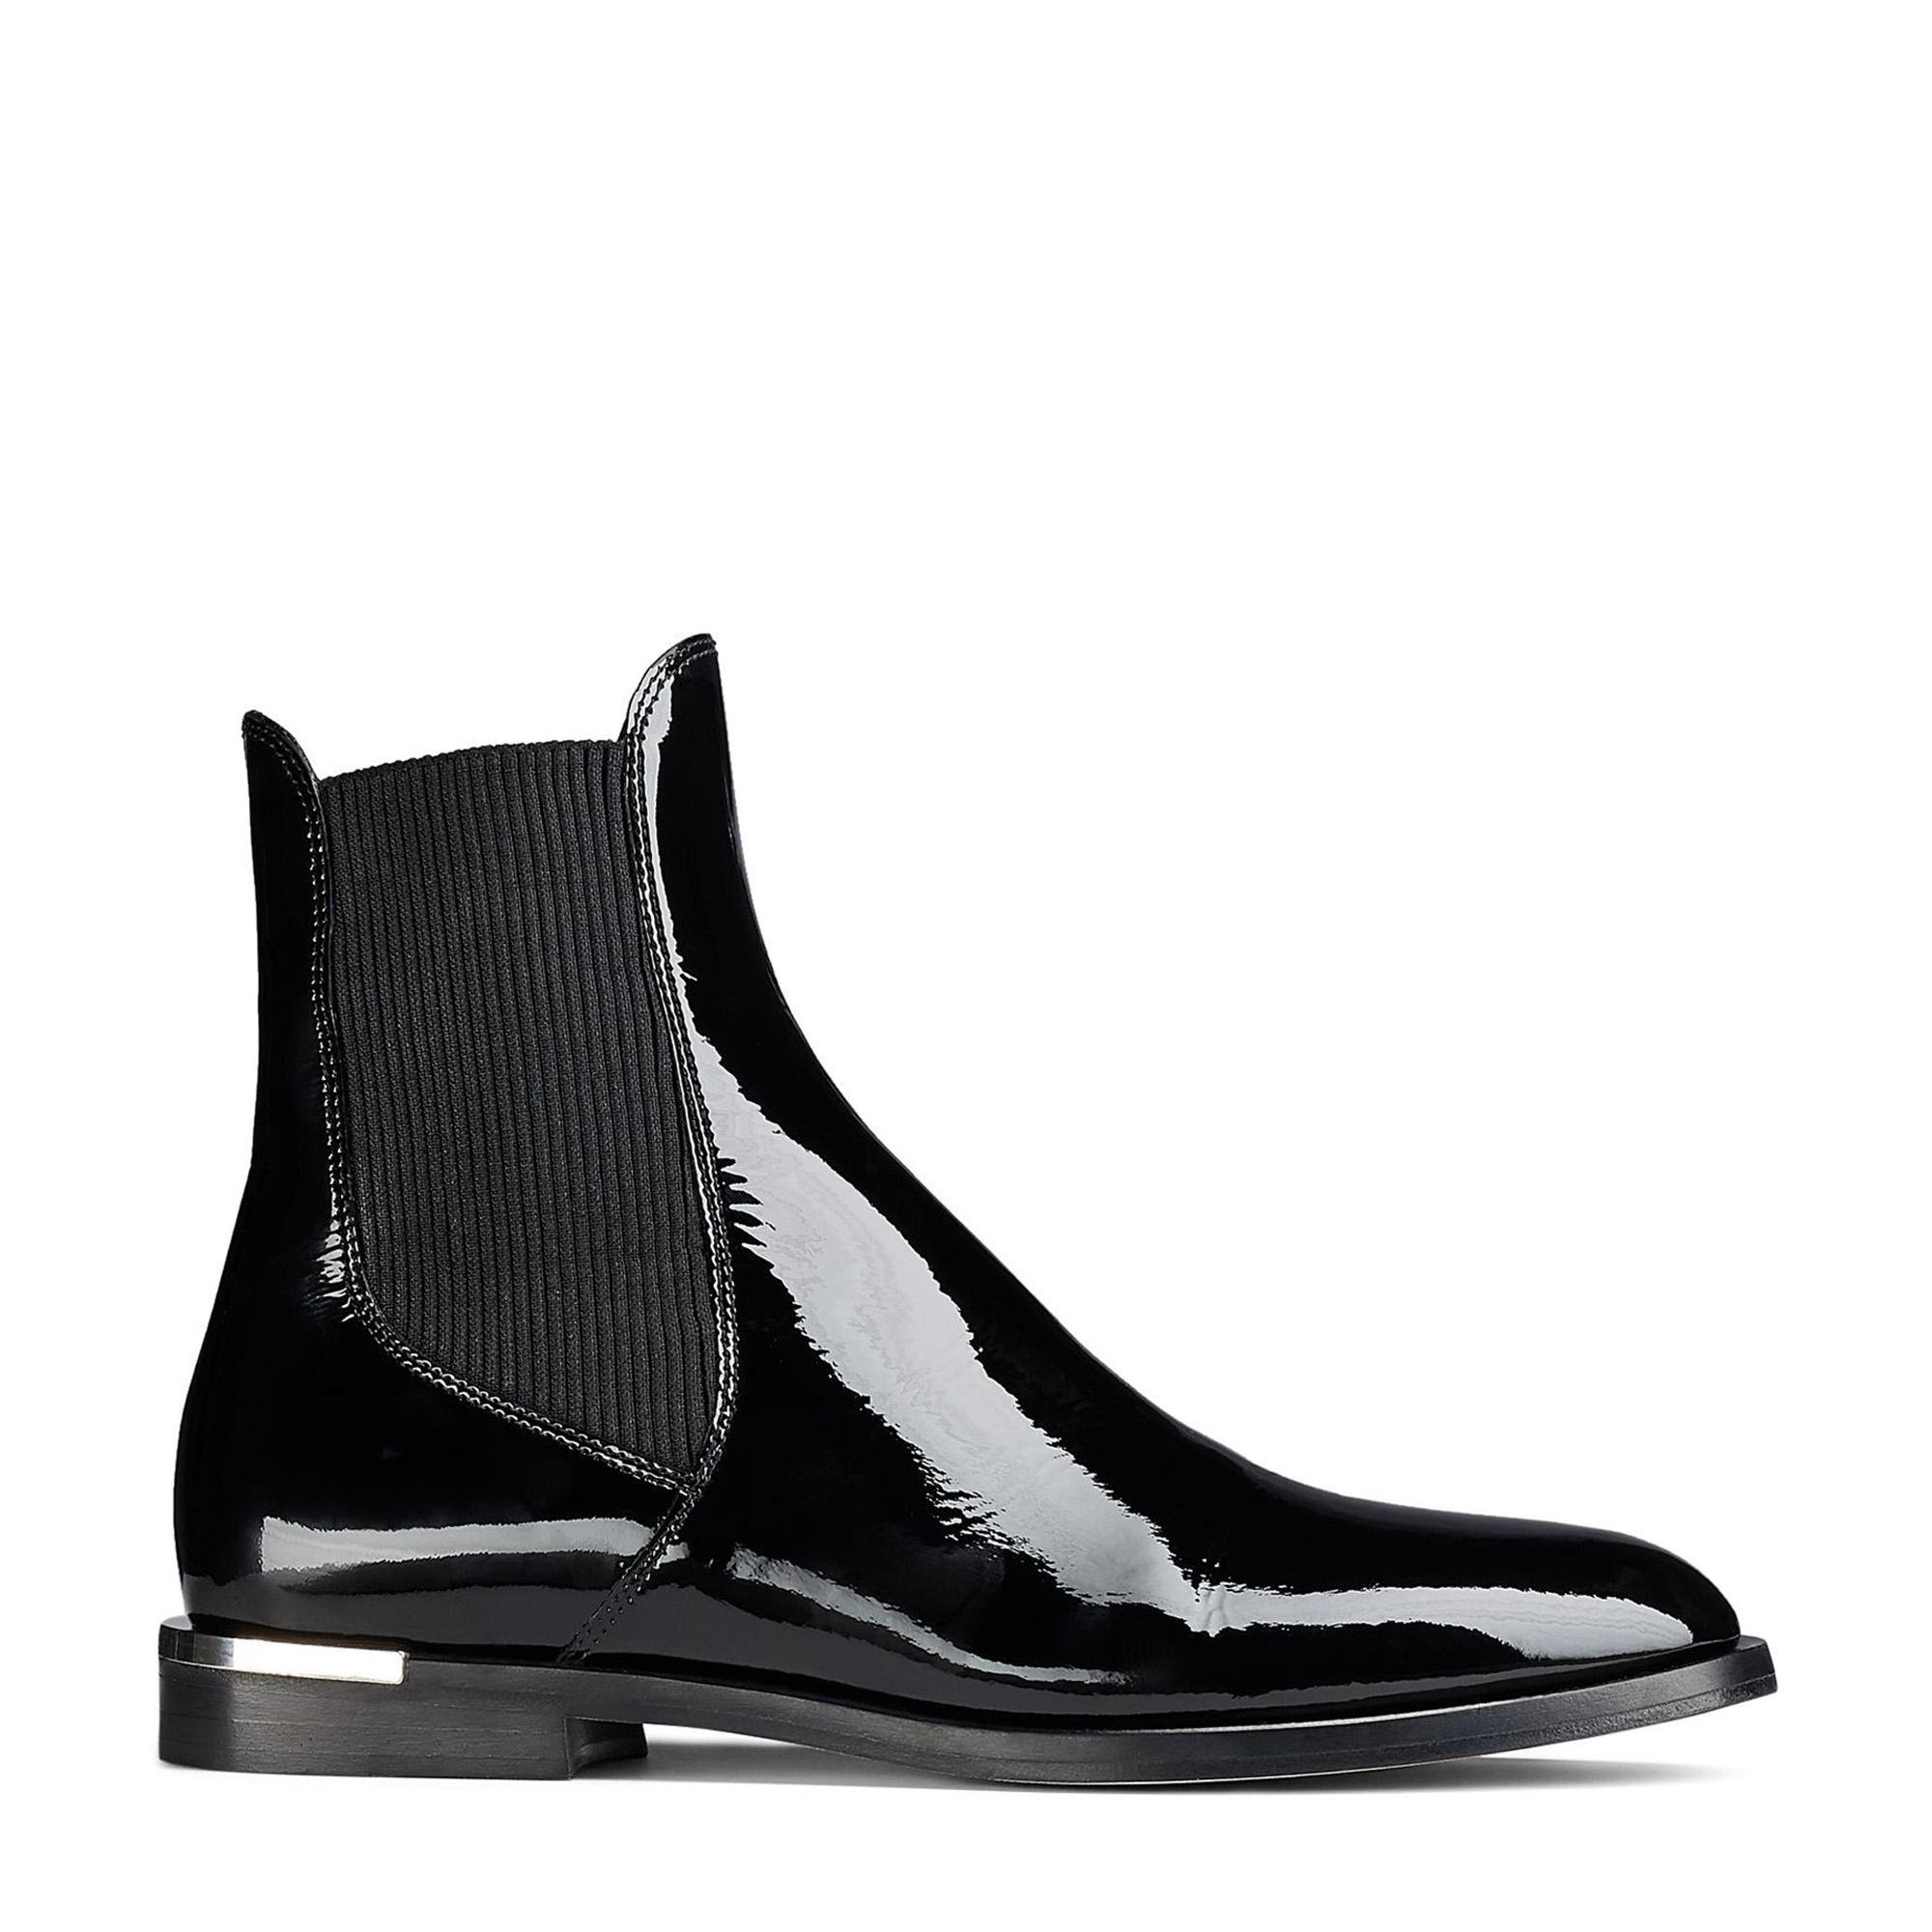 Rourke boots